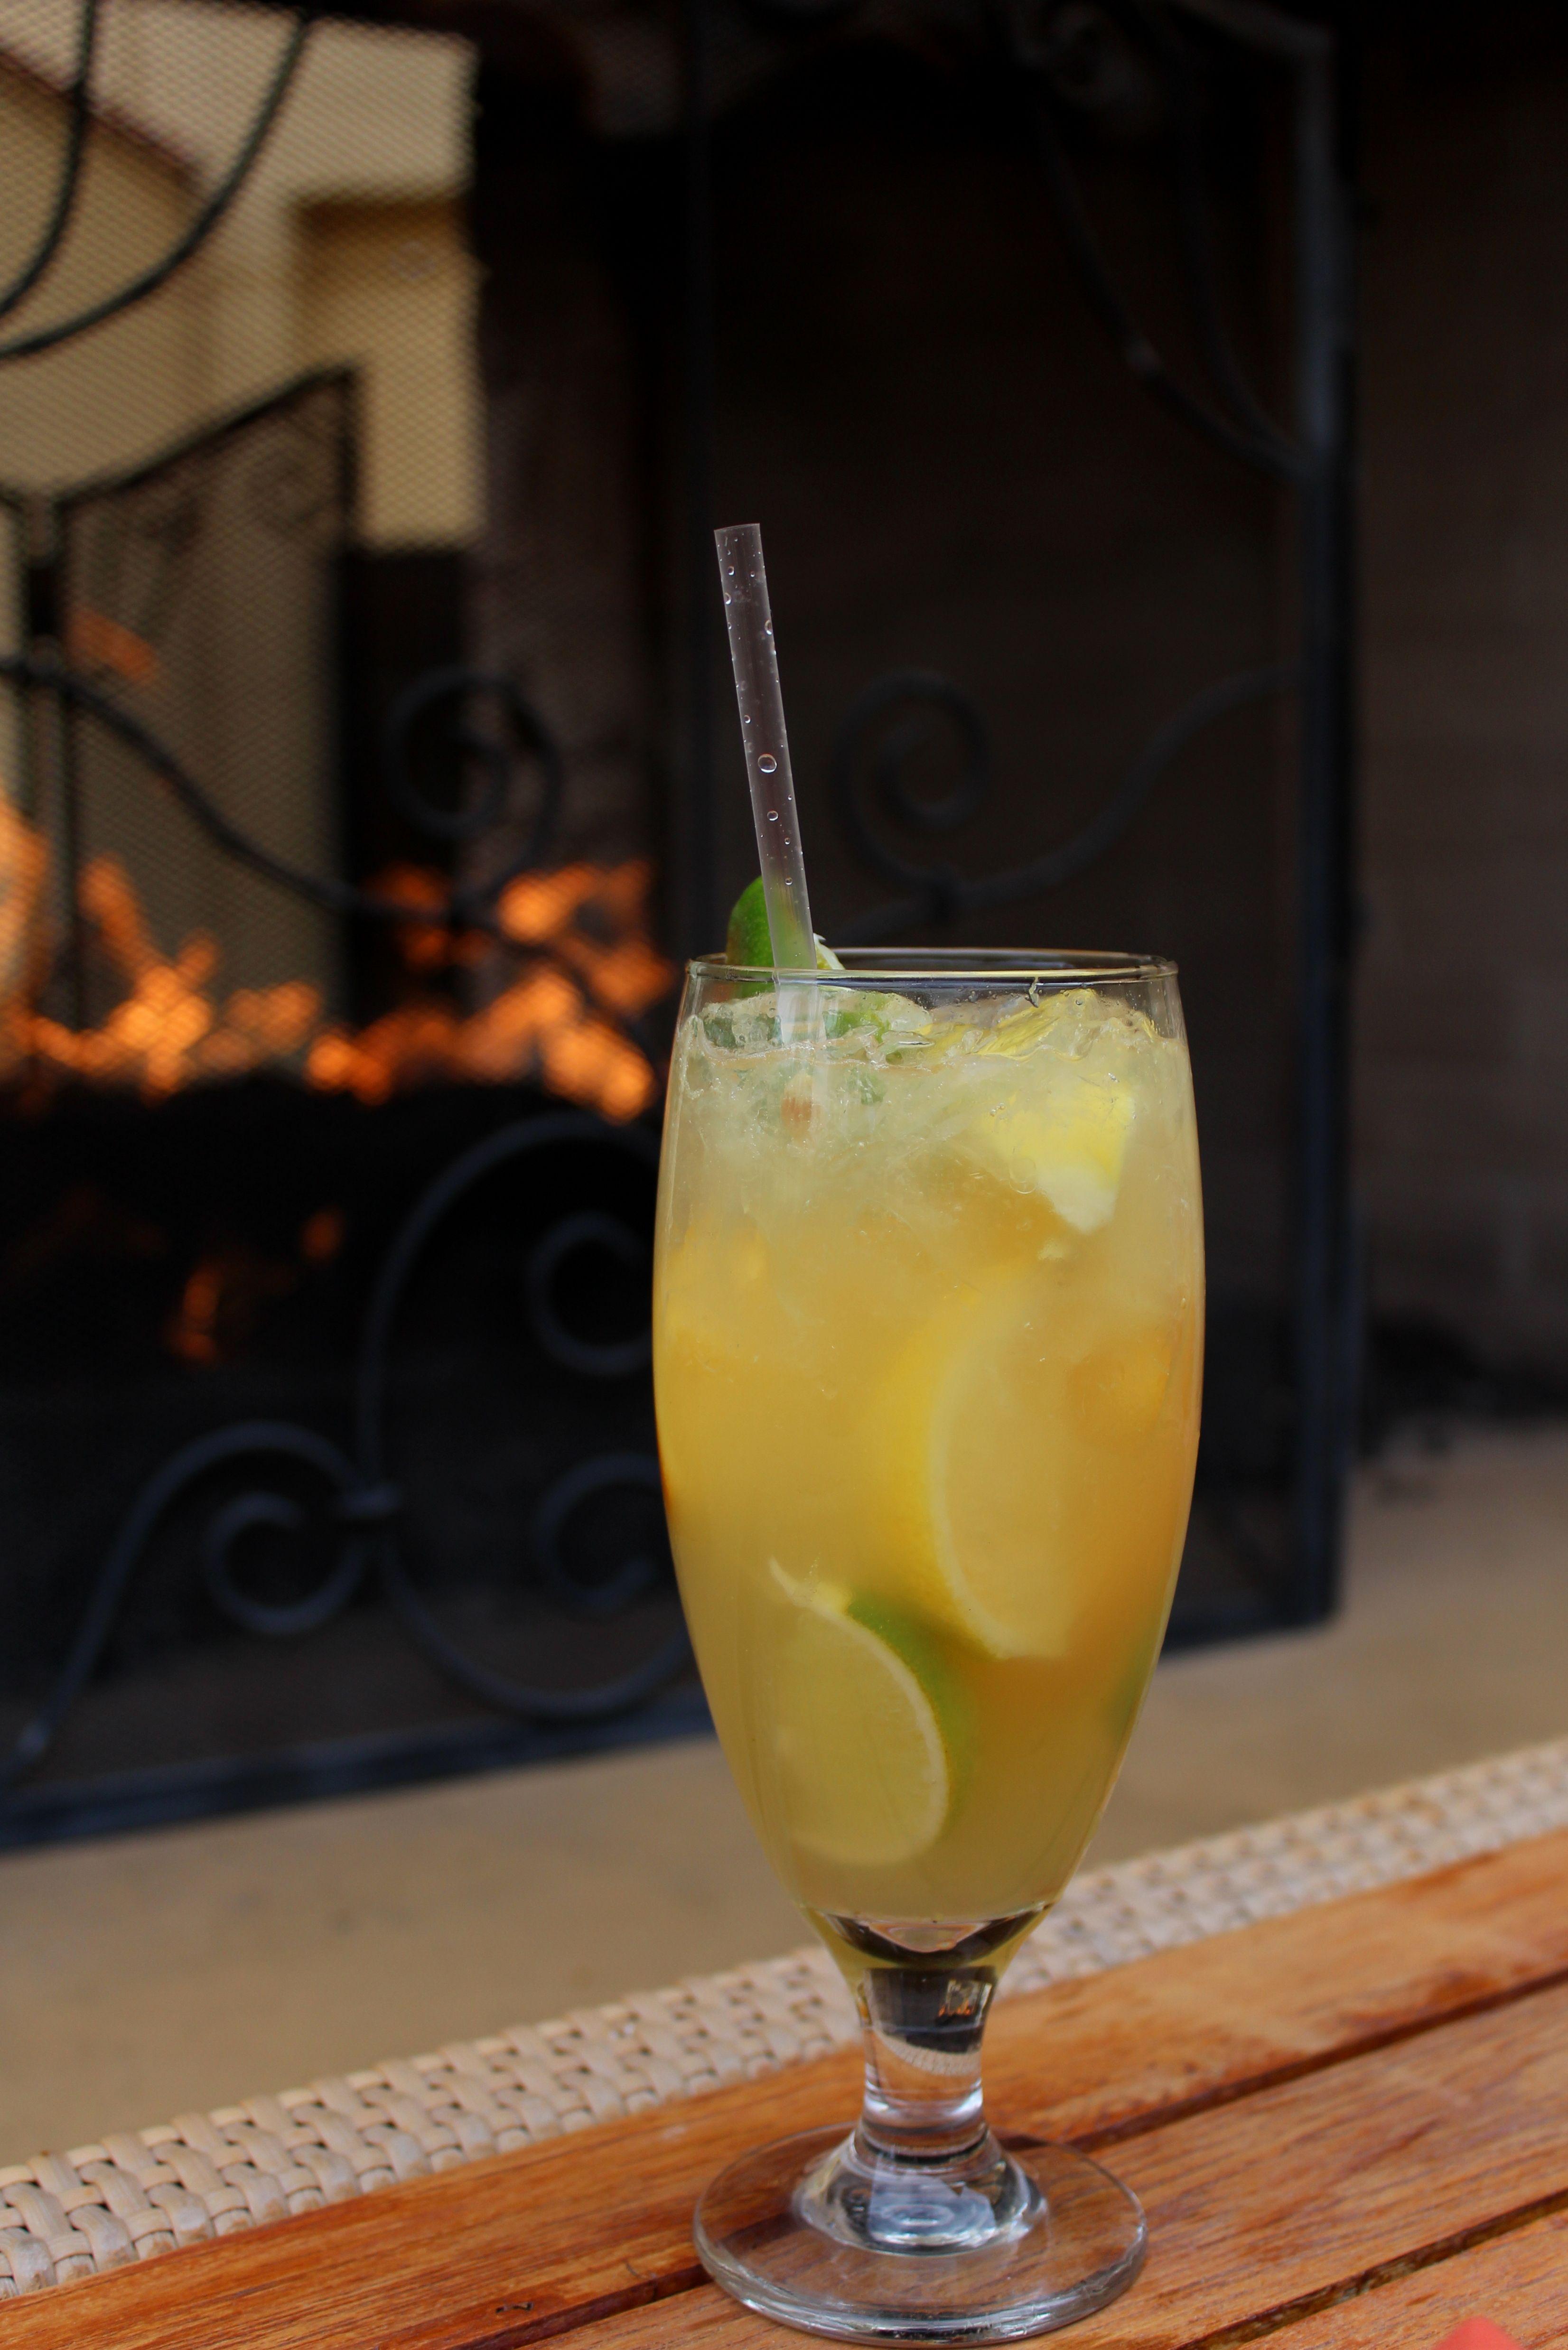 NECTARITA Recipe  * Lime, lemon, orange slice * 1.5 oz tequila * Fresh lime juice * Dash of agave nectar  * Shake on the ROCKS and voilà! Enjoy!